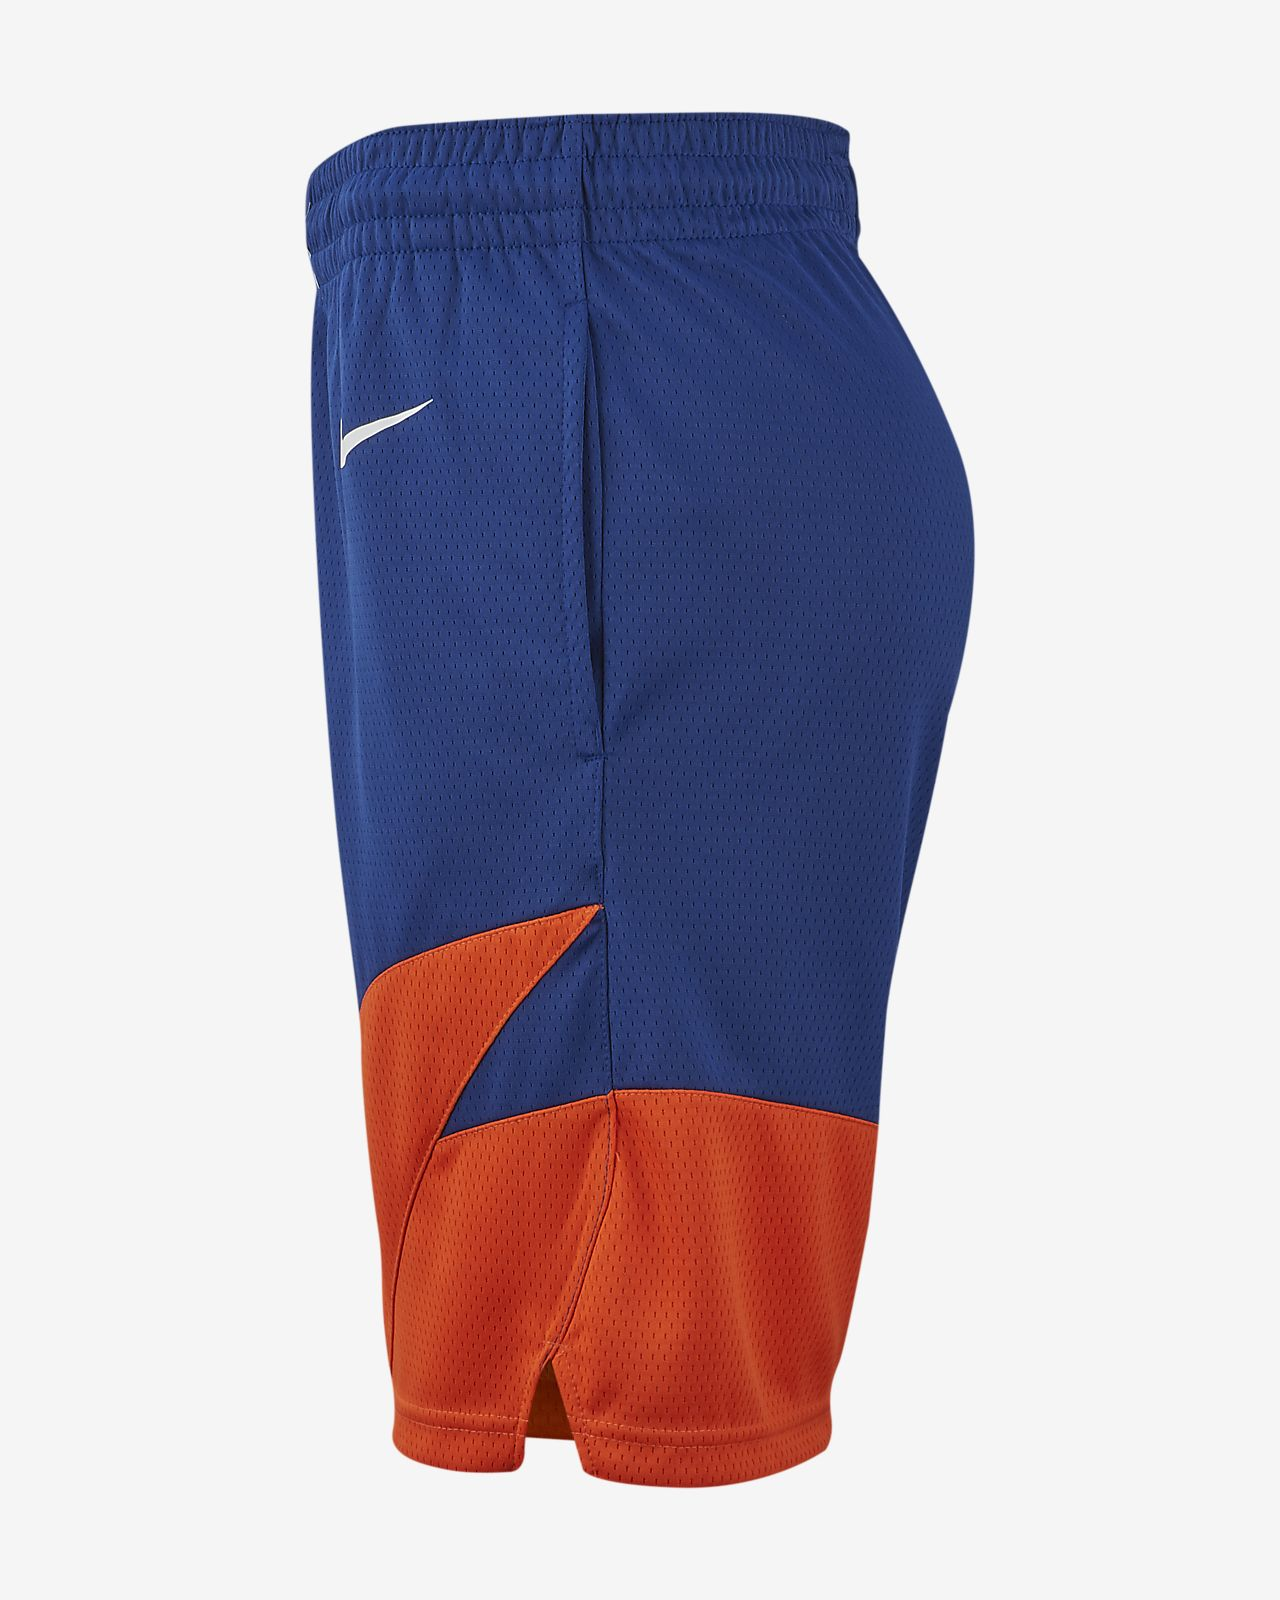 d47bb8fa039 Cleveland Cavaliers City Edition Swingman Men s Nike NBA Shorts ...